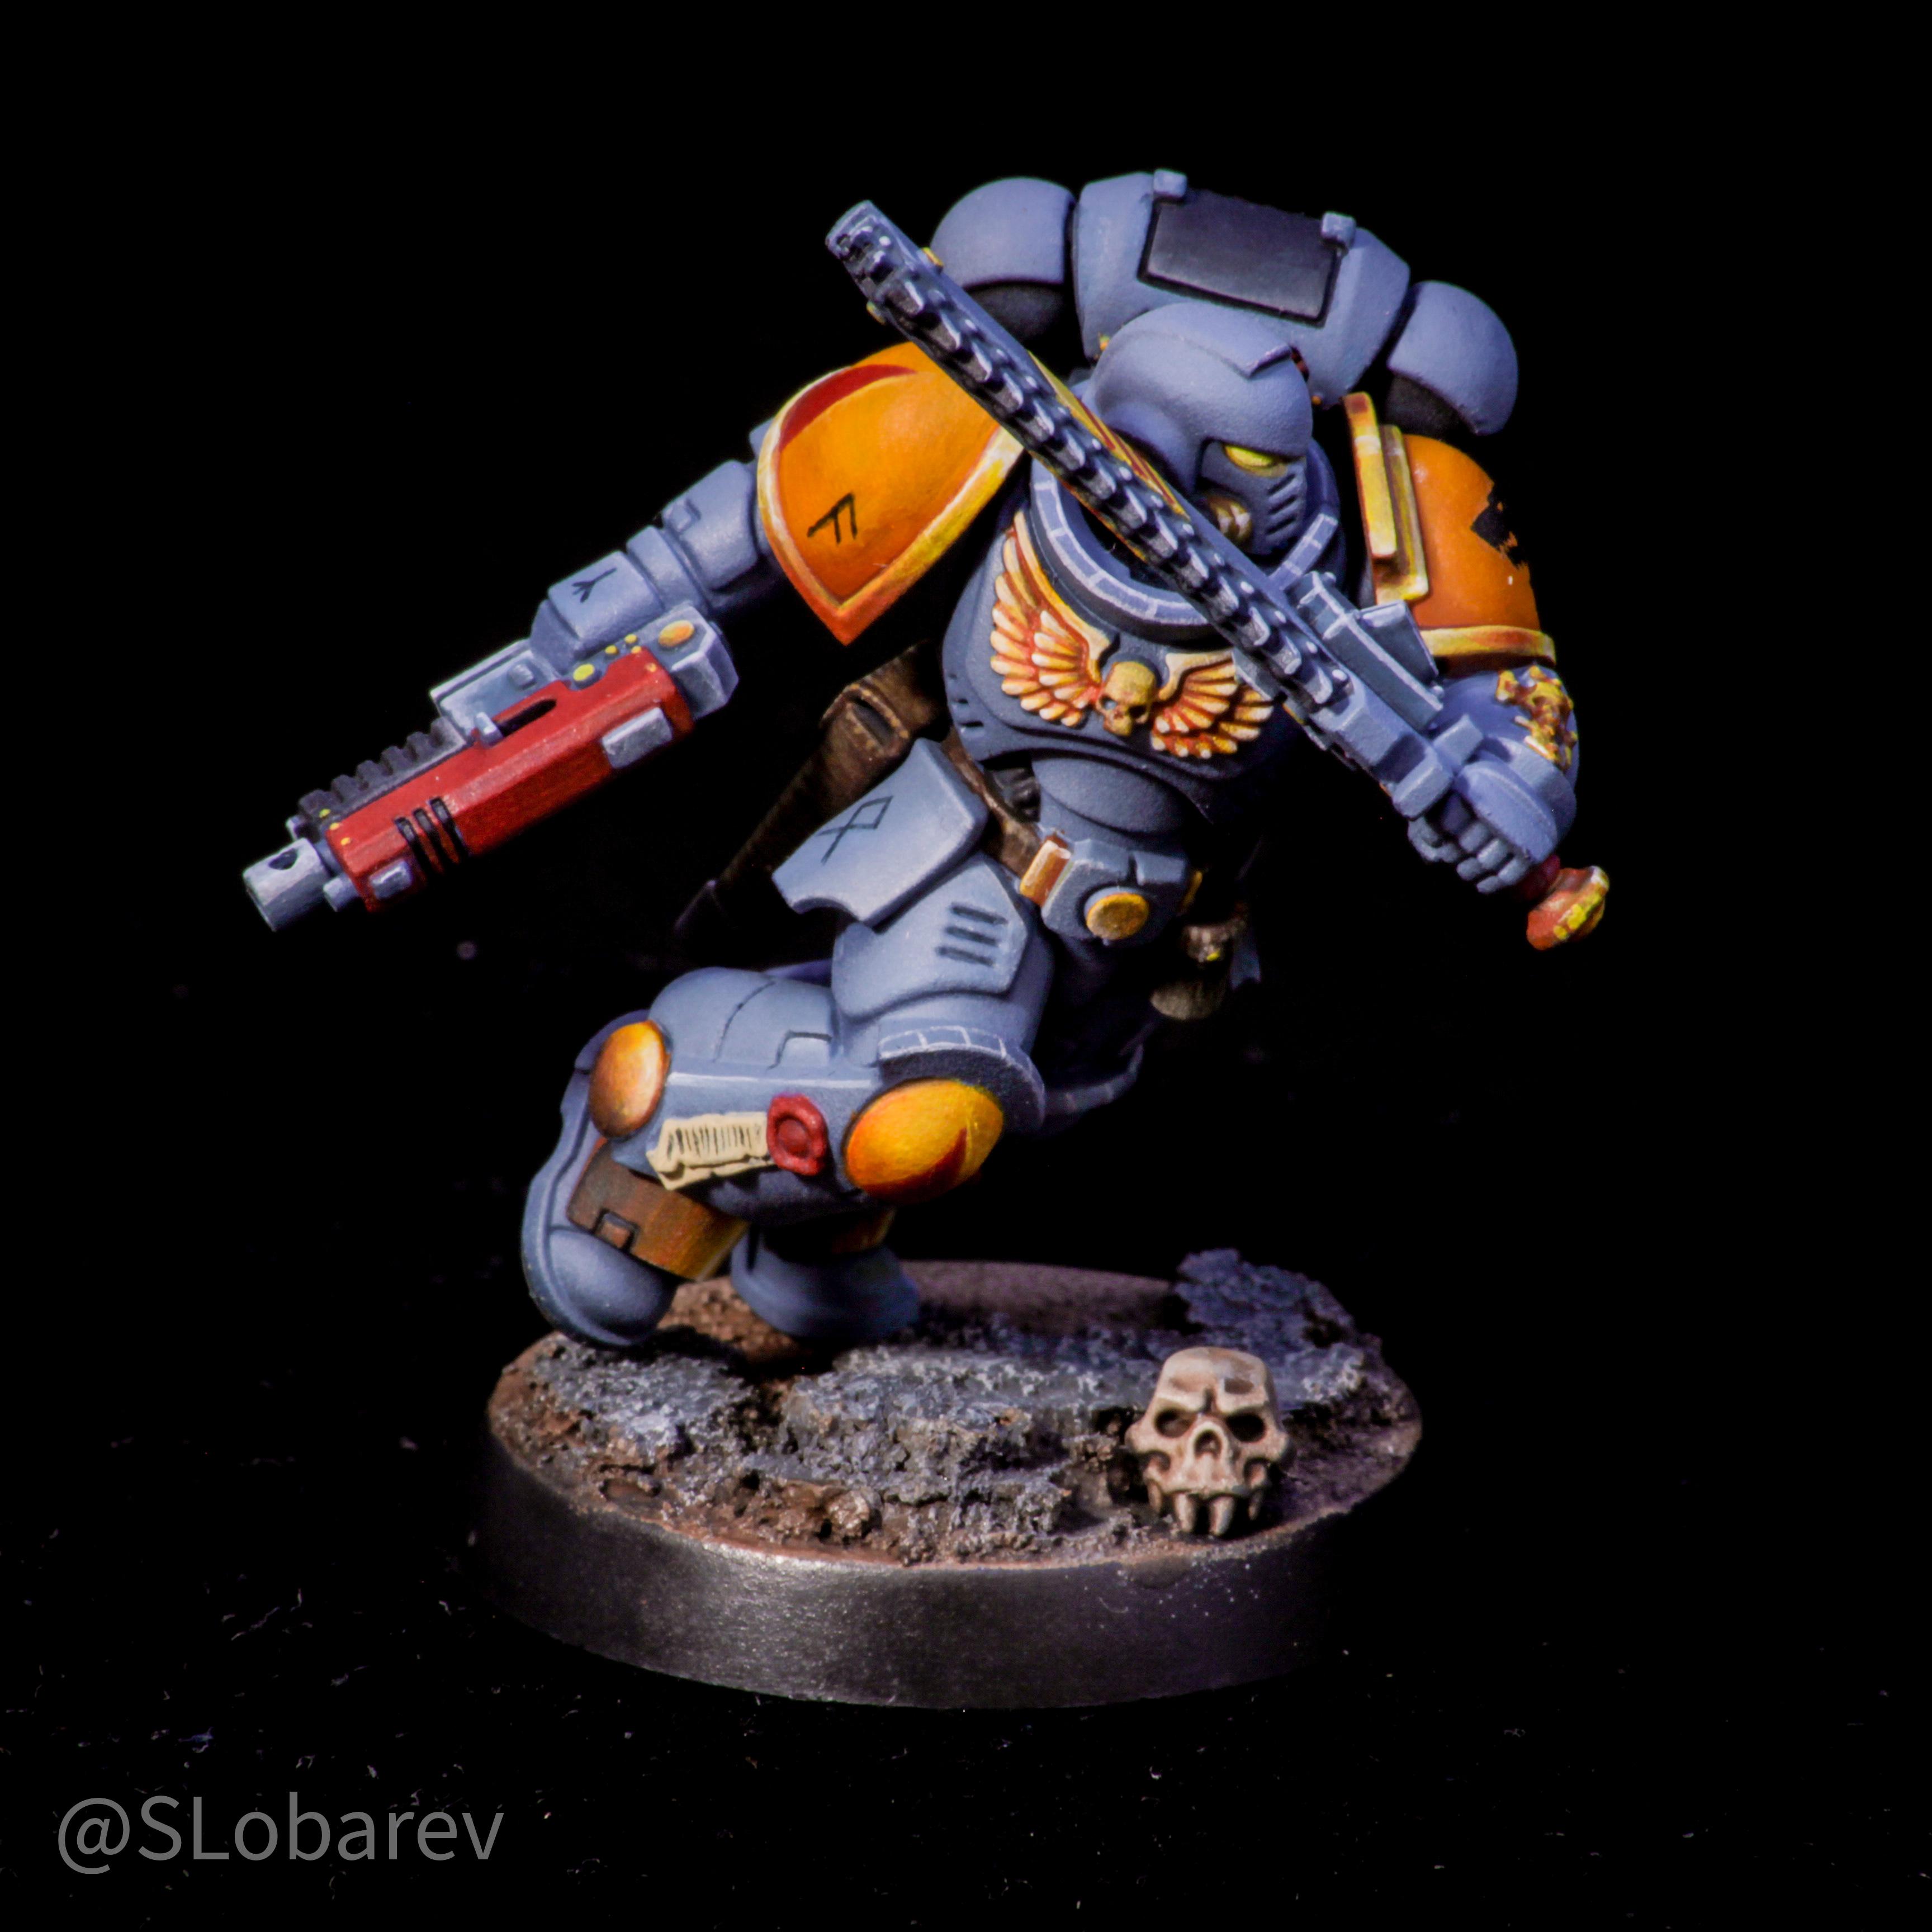 Space Wolves Assault intercessor sergeant